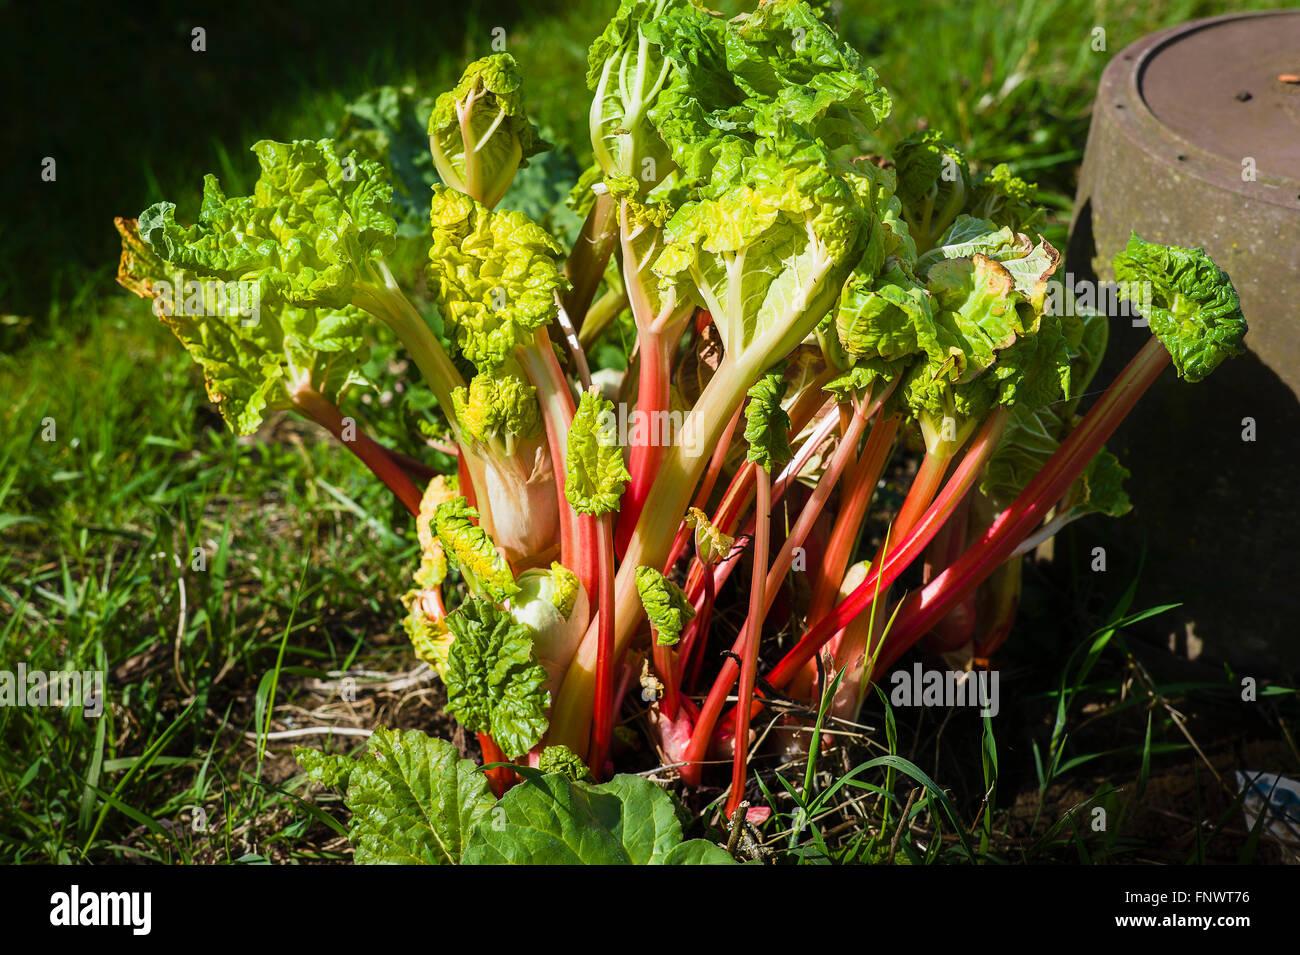 Healthy Stockbridge Arrow rhubarb ready for first picking of the season - Stock Image